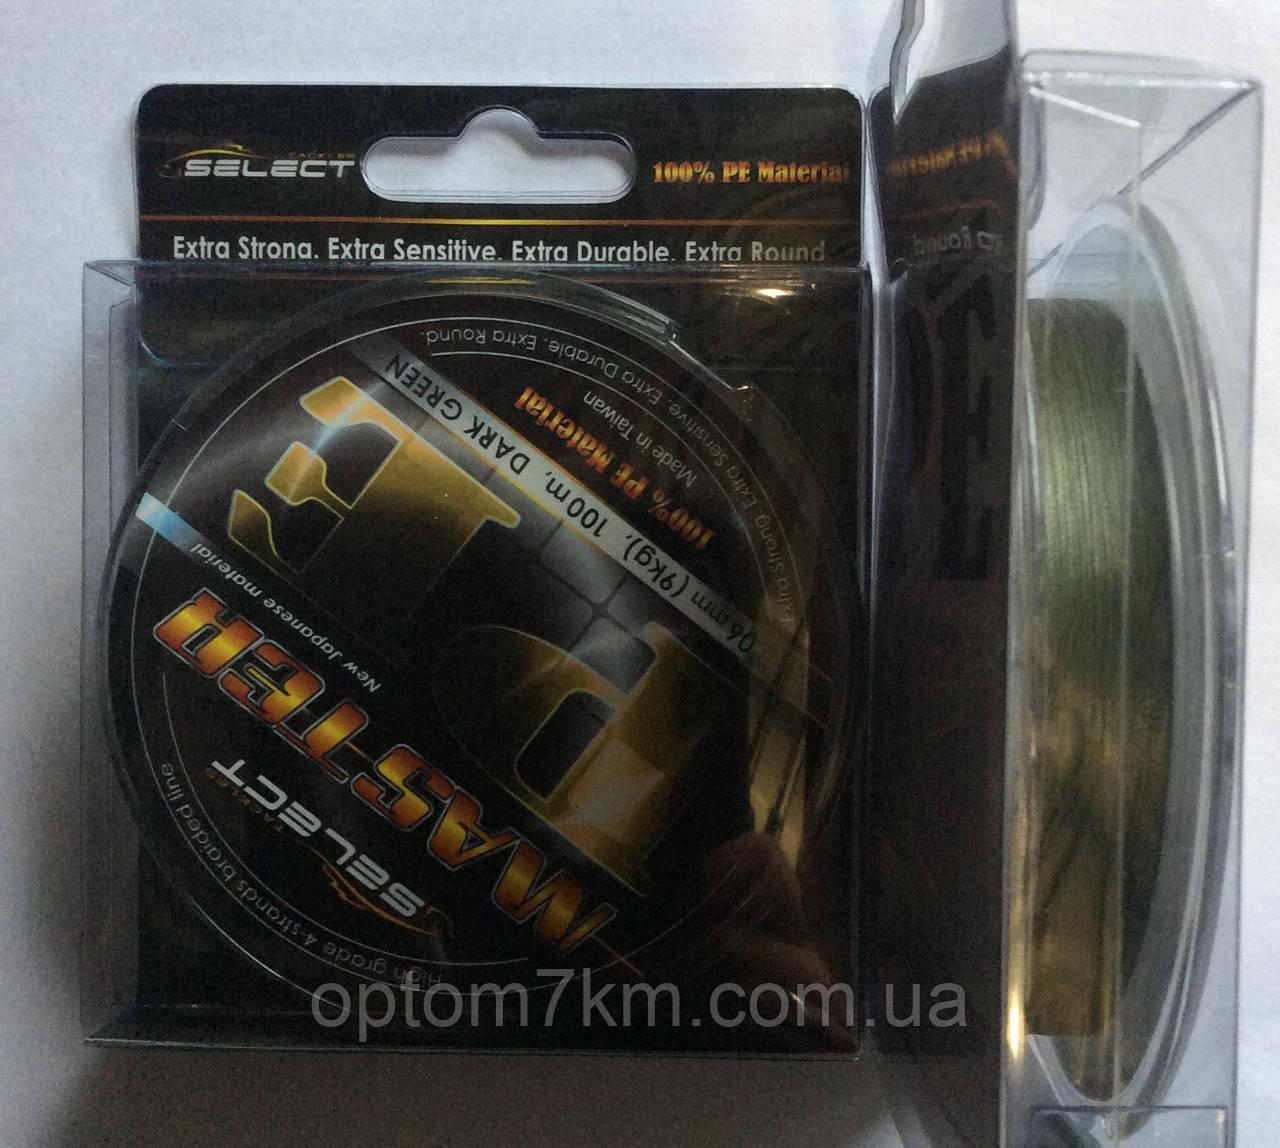 Шнур рыболовный Select Master PE 100m 0.06-0,10